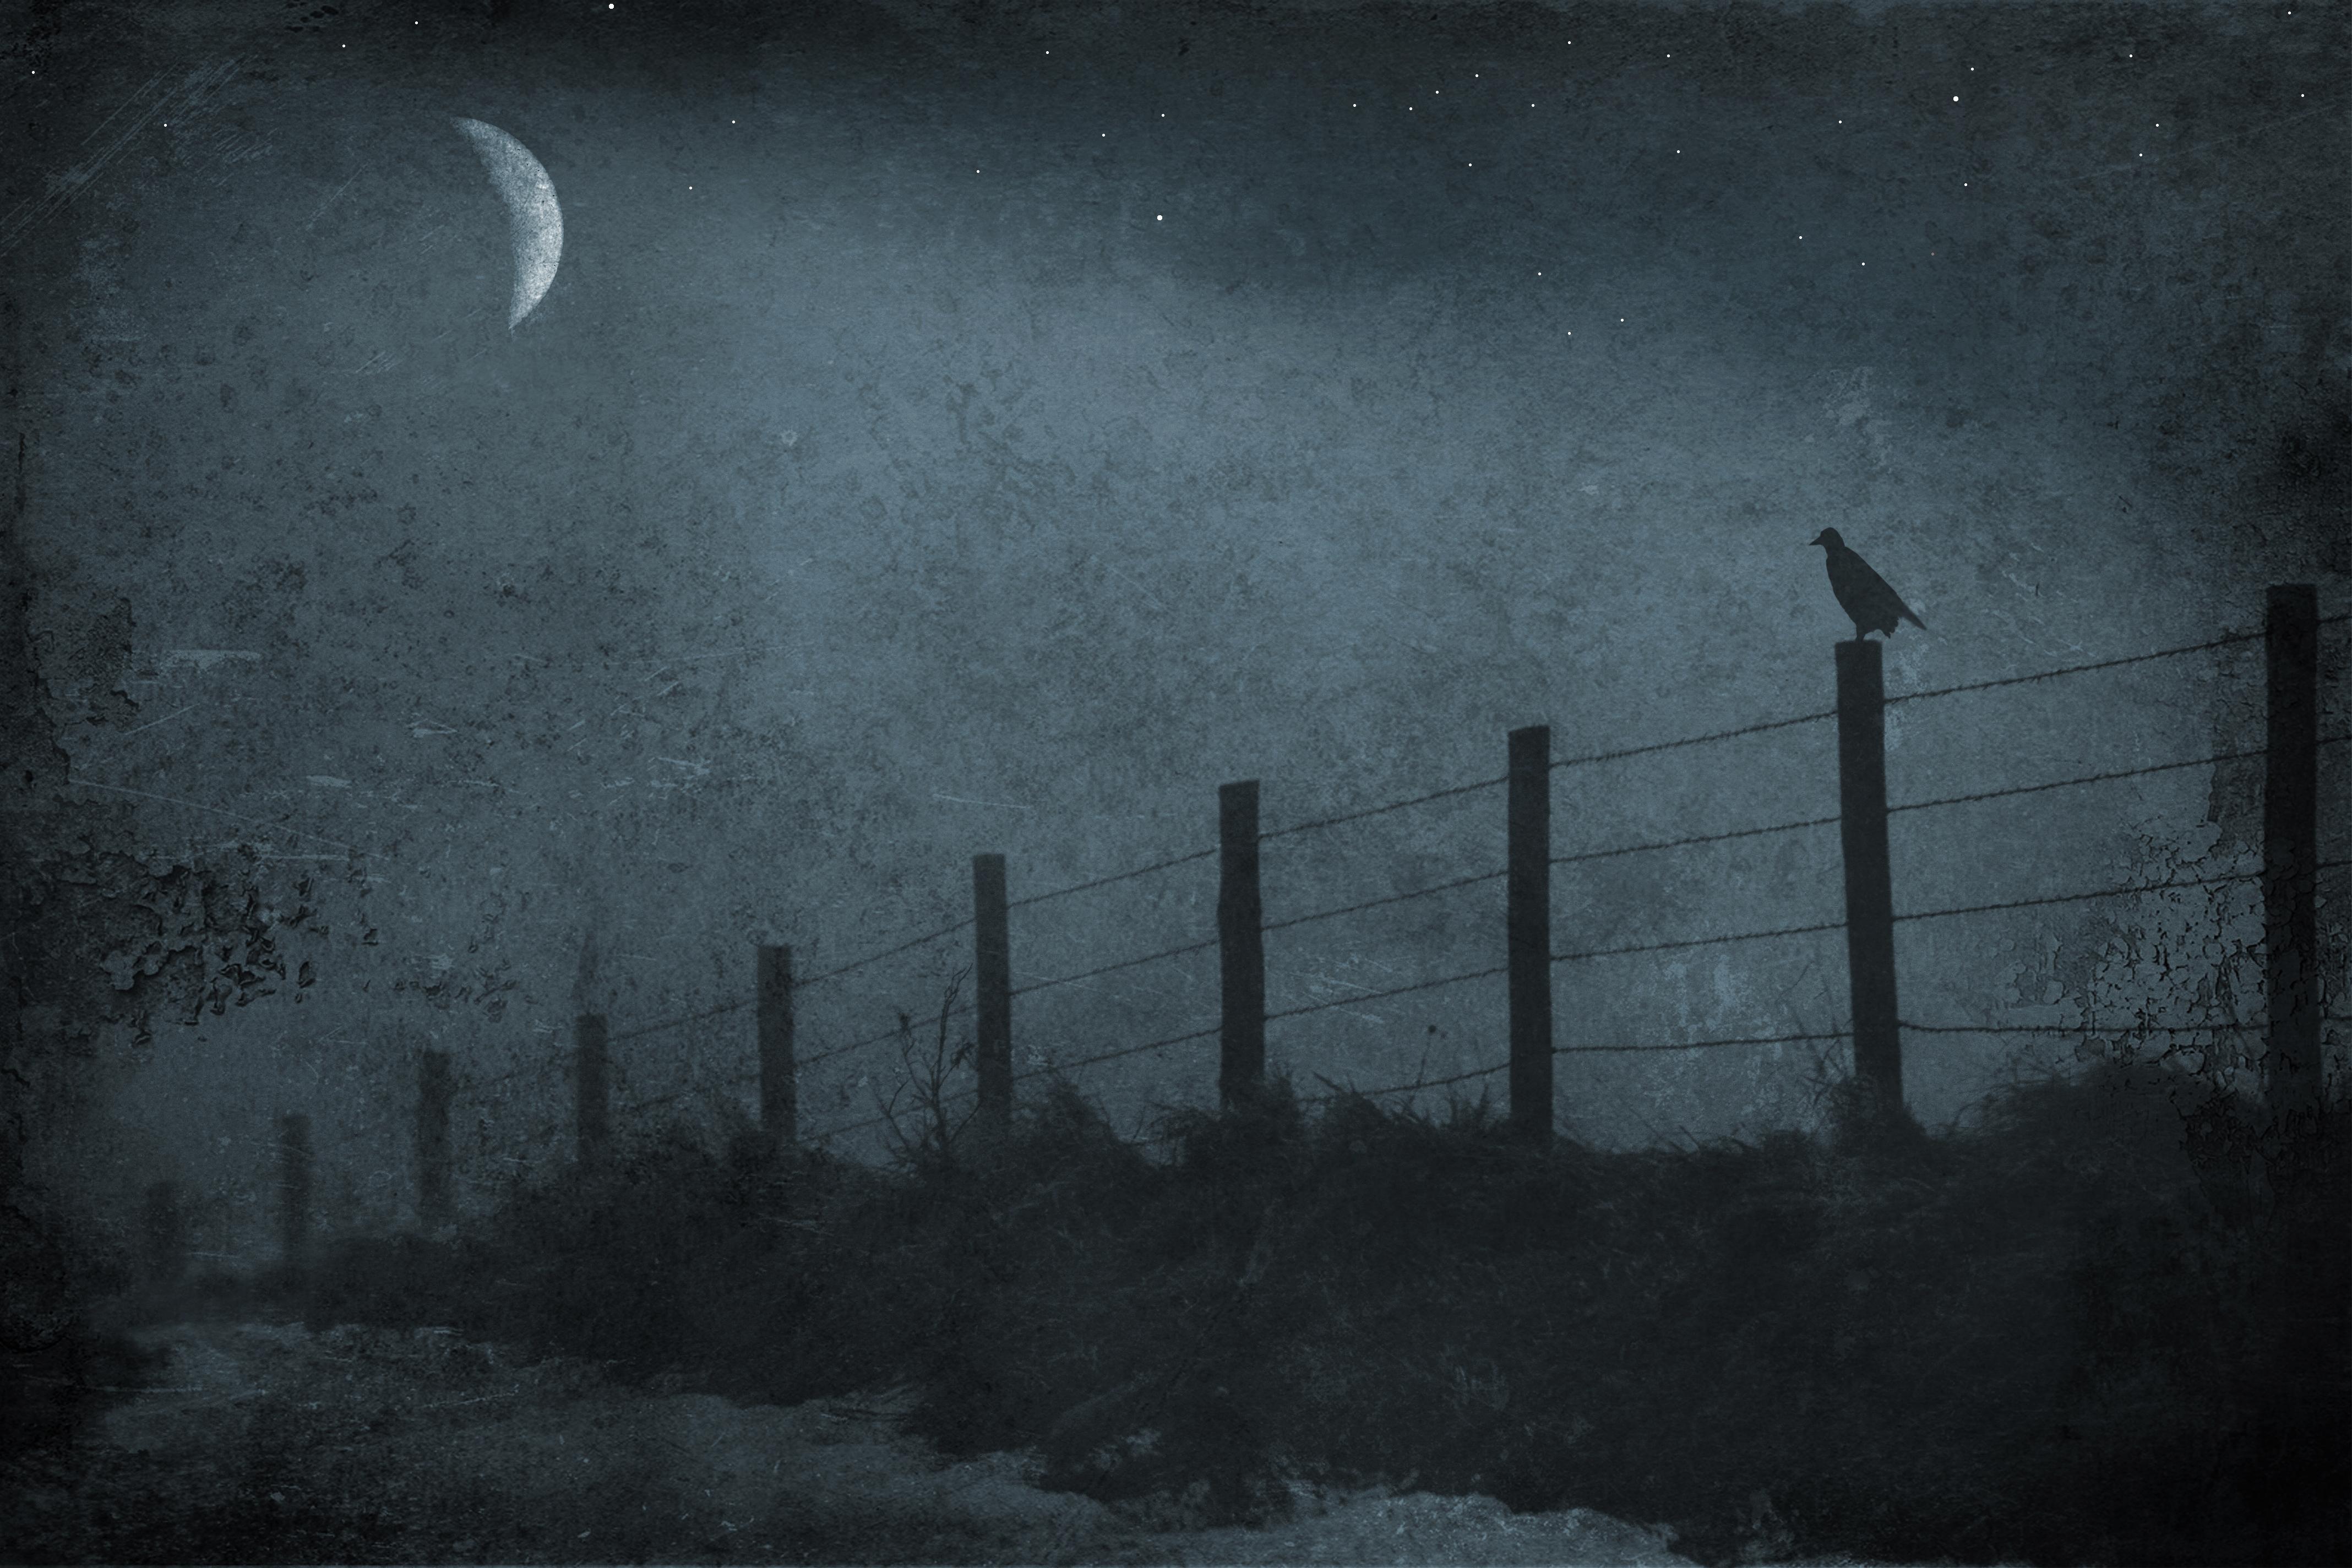 Wallpaper Monochrome Night Stars Moon Canon Moonlight Texture Atmosphere Fence Lyrics Weather Elitegalleryaoi Darkness Blackbird Idream